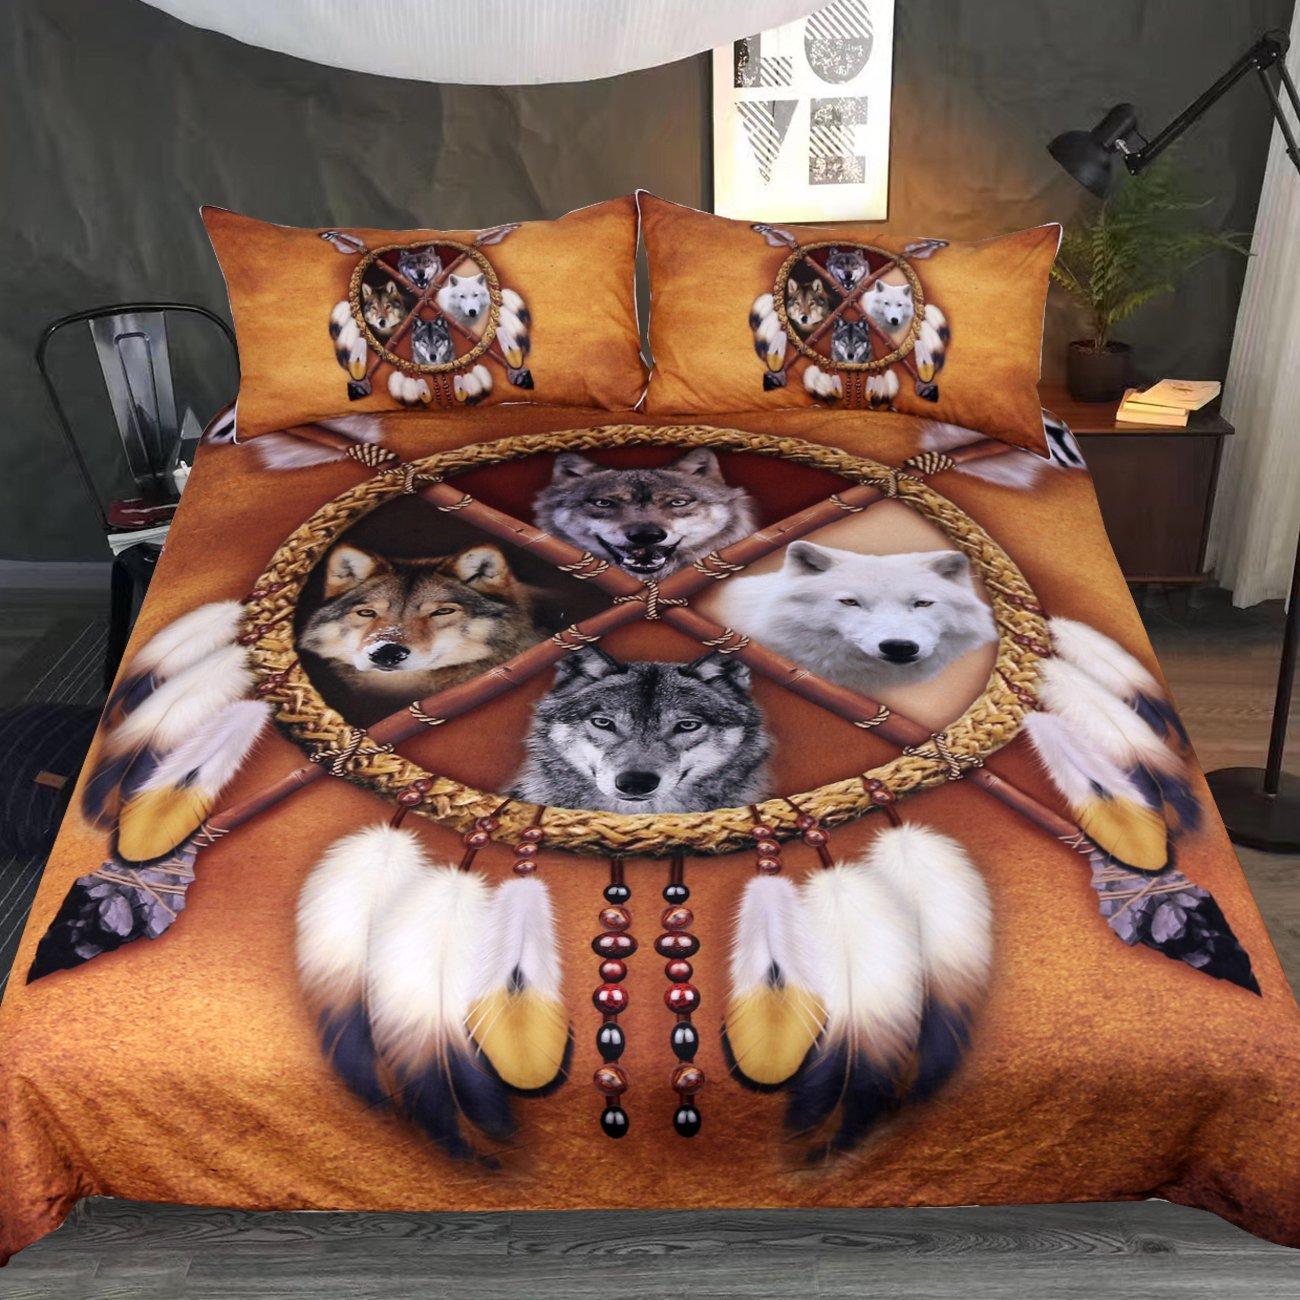 Sleepwish Wolf Dream Catcher Bedspread Native American Bedding Wolf Quilt Cover Golden Brown Indian Duvet Cover (King,86''x94'' 3pcs, 4 wolves dreamcatcher)